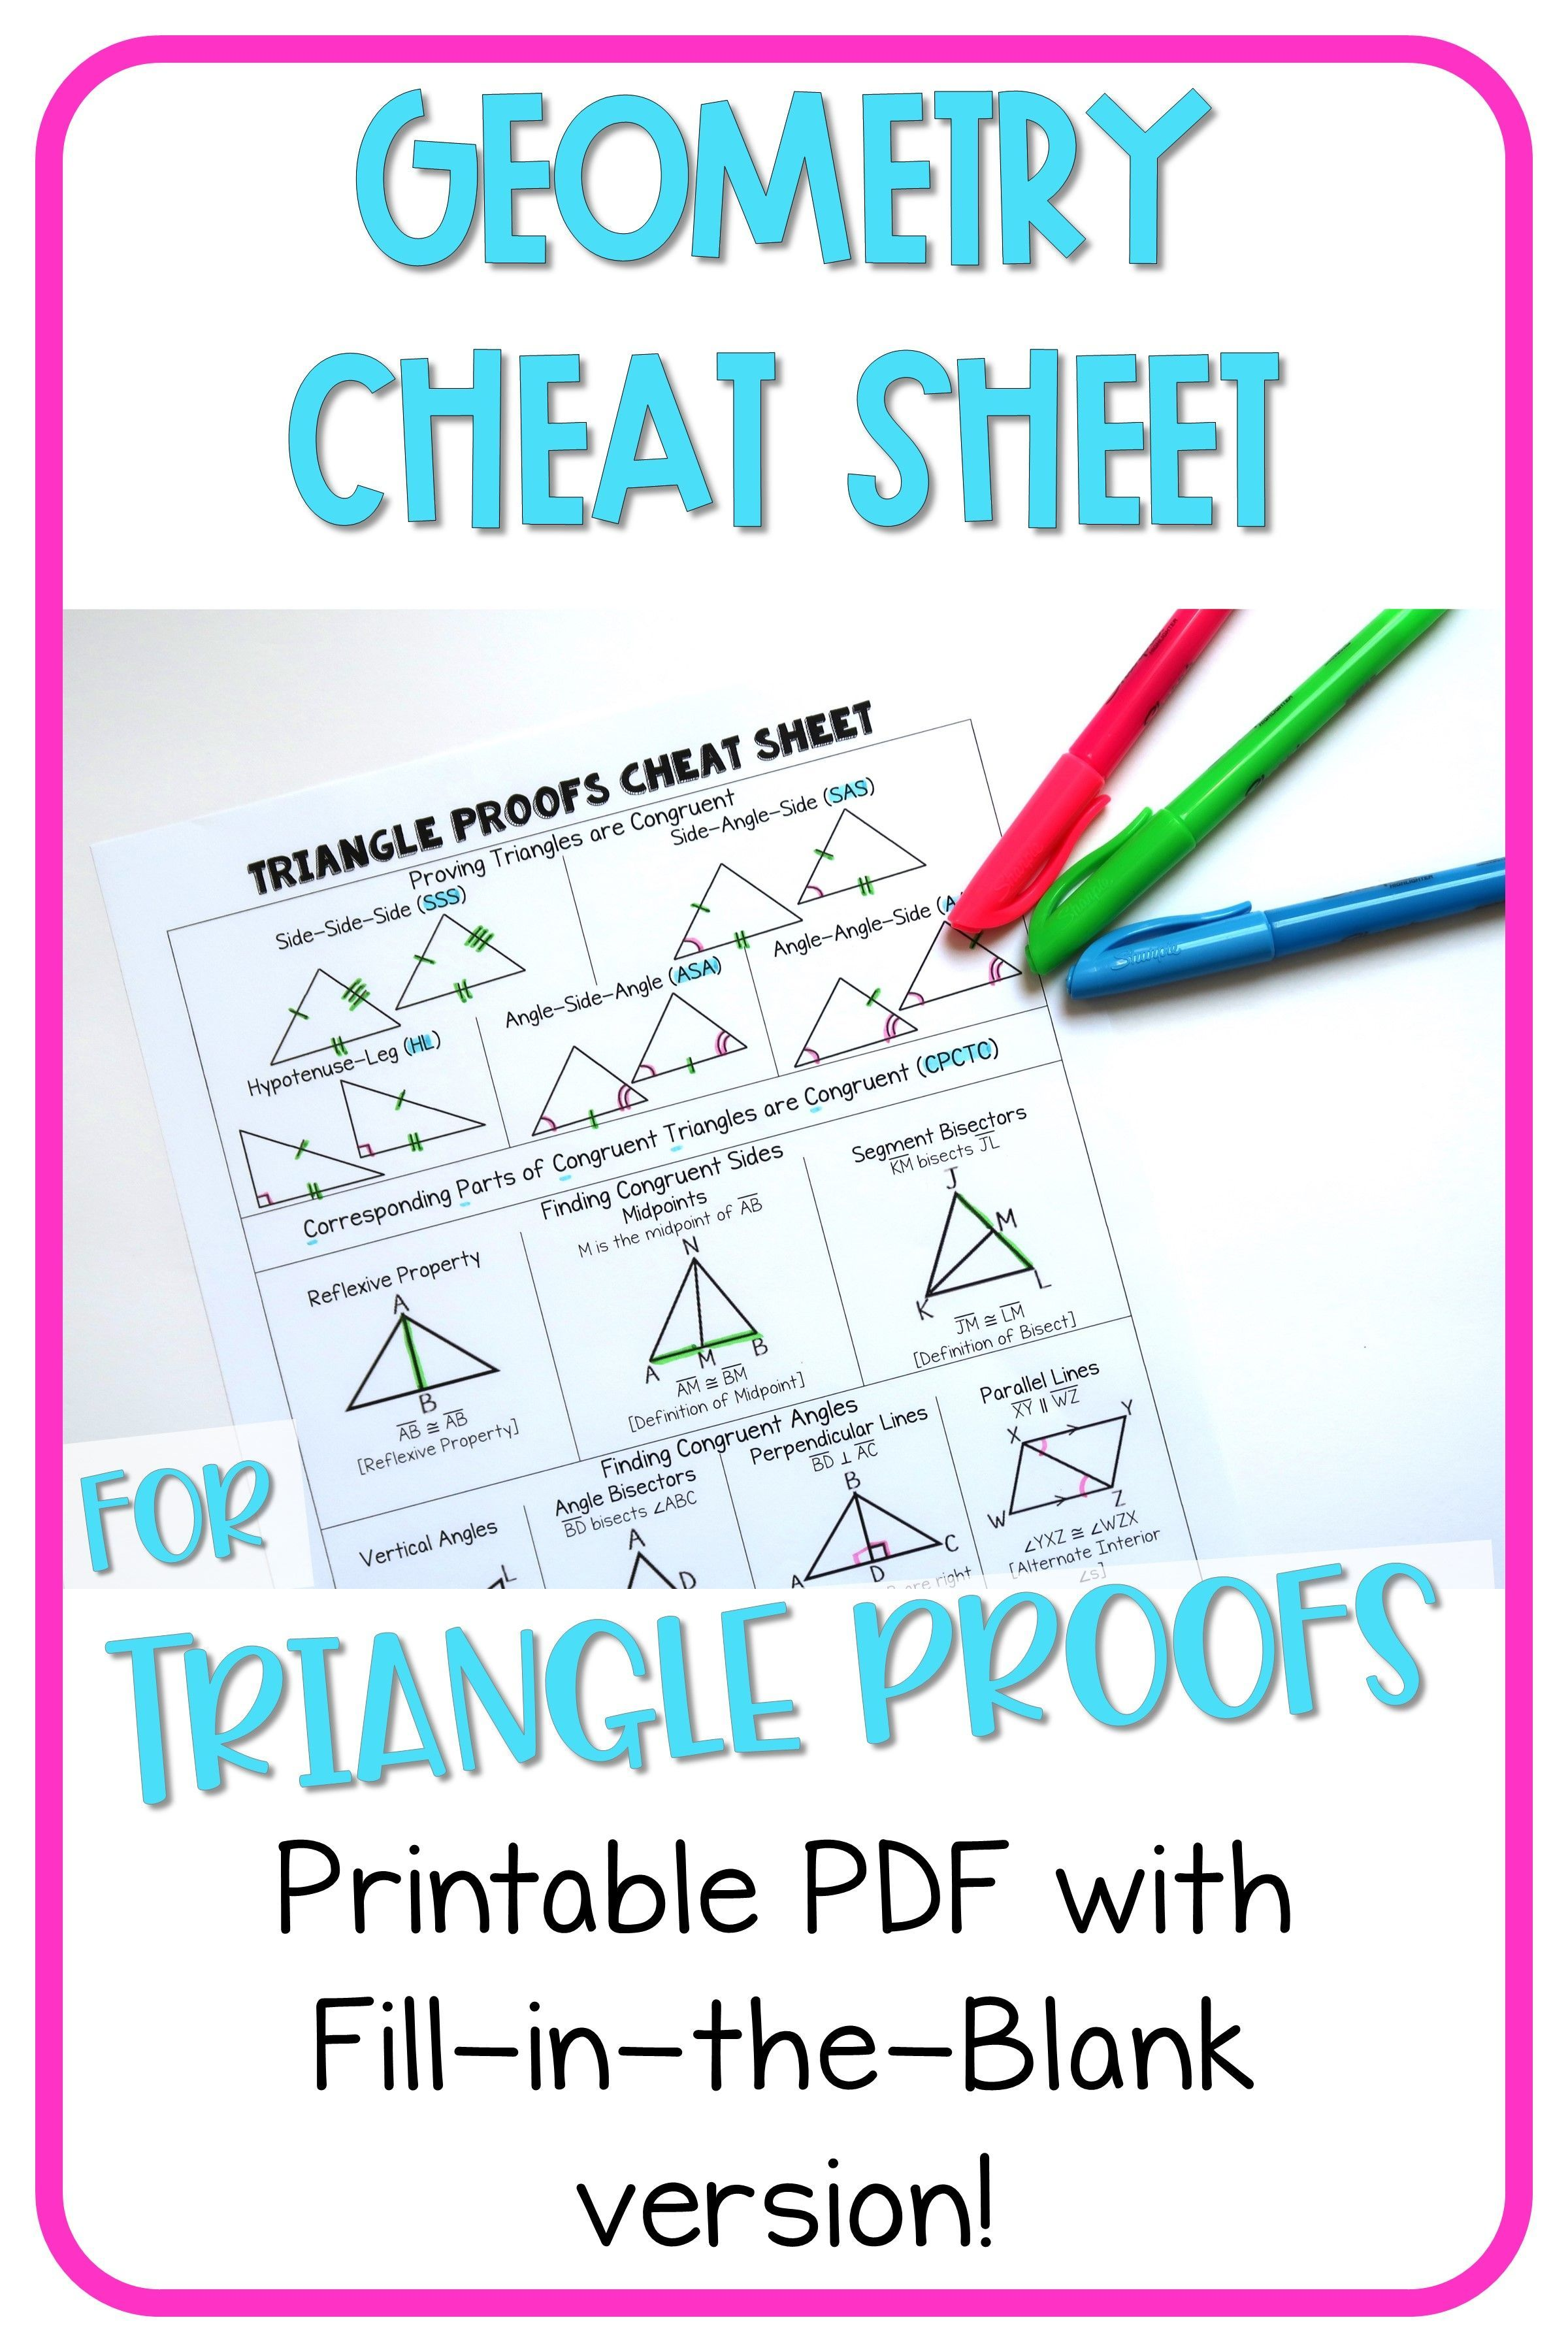 Geometry Cheat Sheet Triangle Proofs